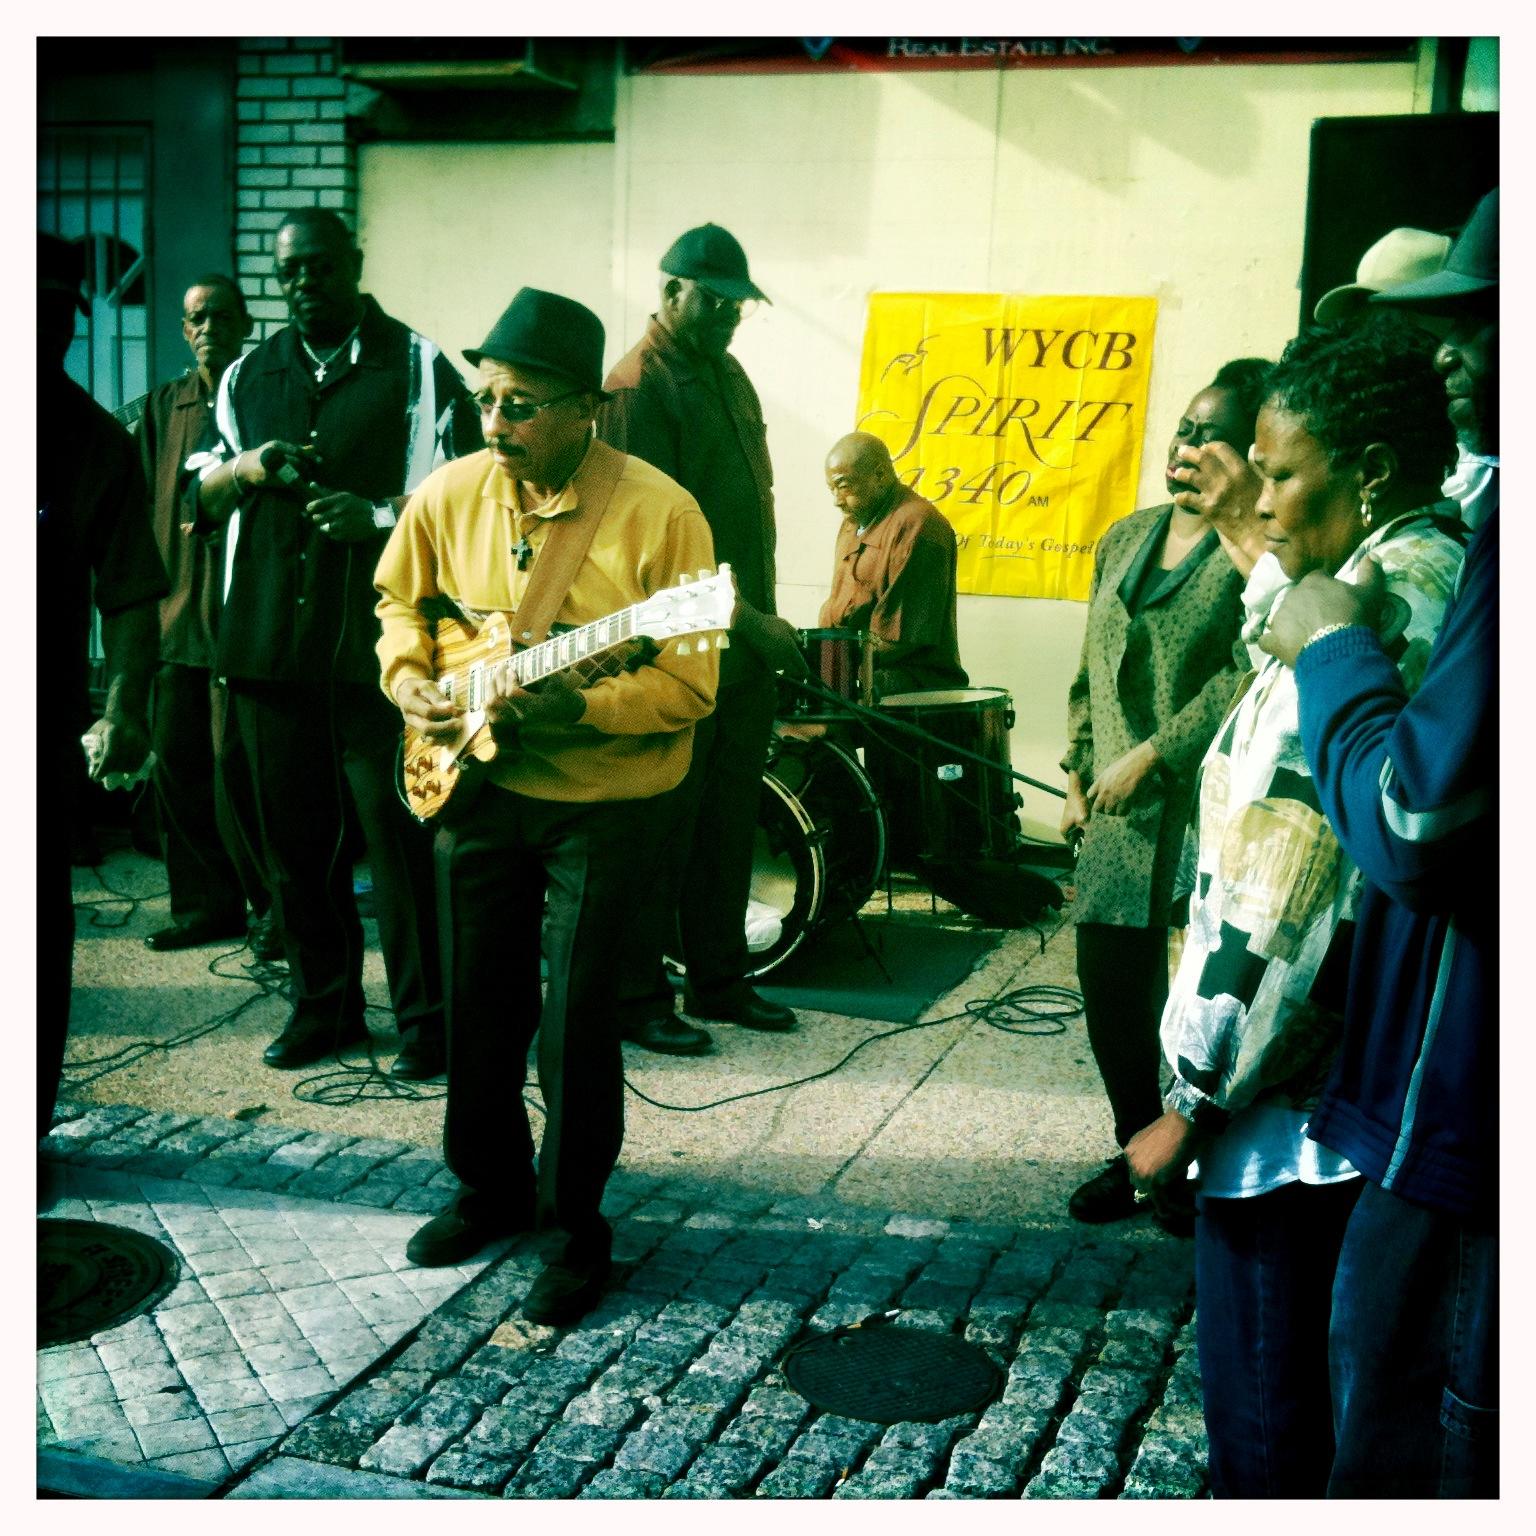 Festival on H Street NE, Washington, DC, 2011